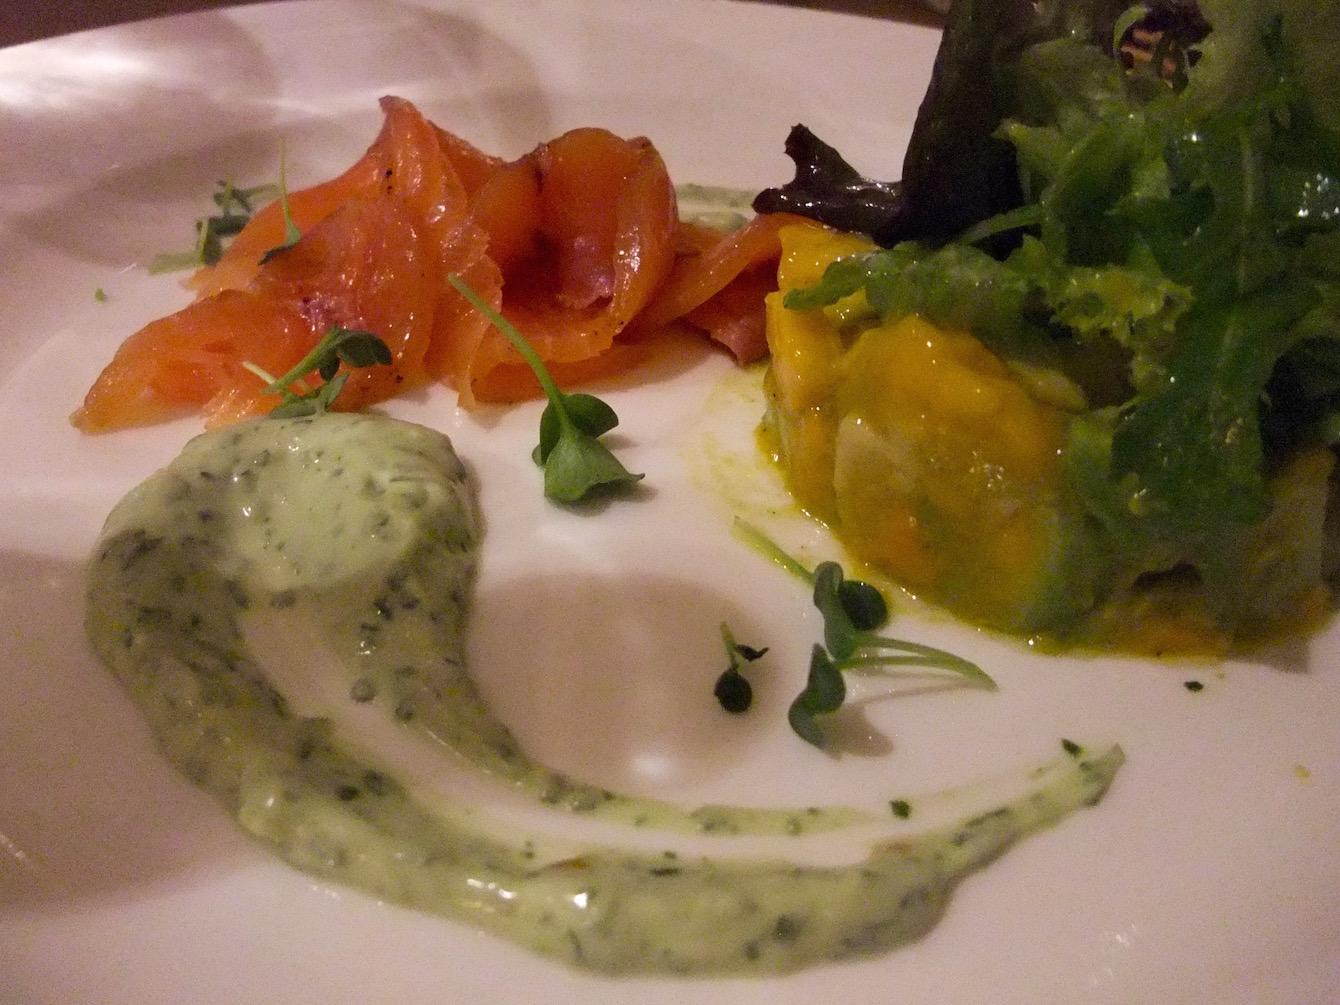 Smoked salmon appetizer with mango-avocado salad